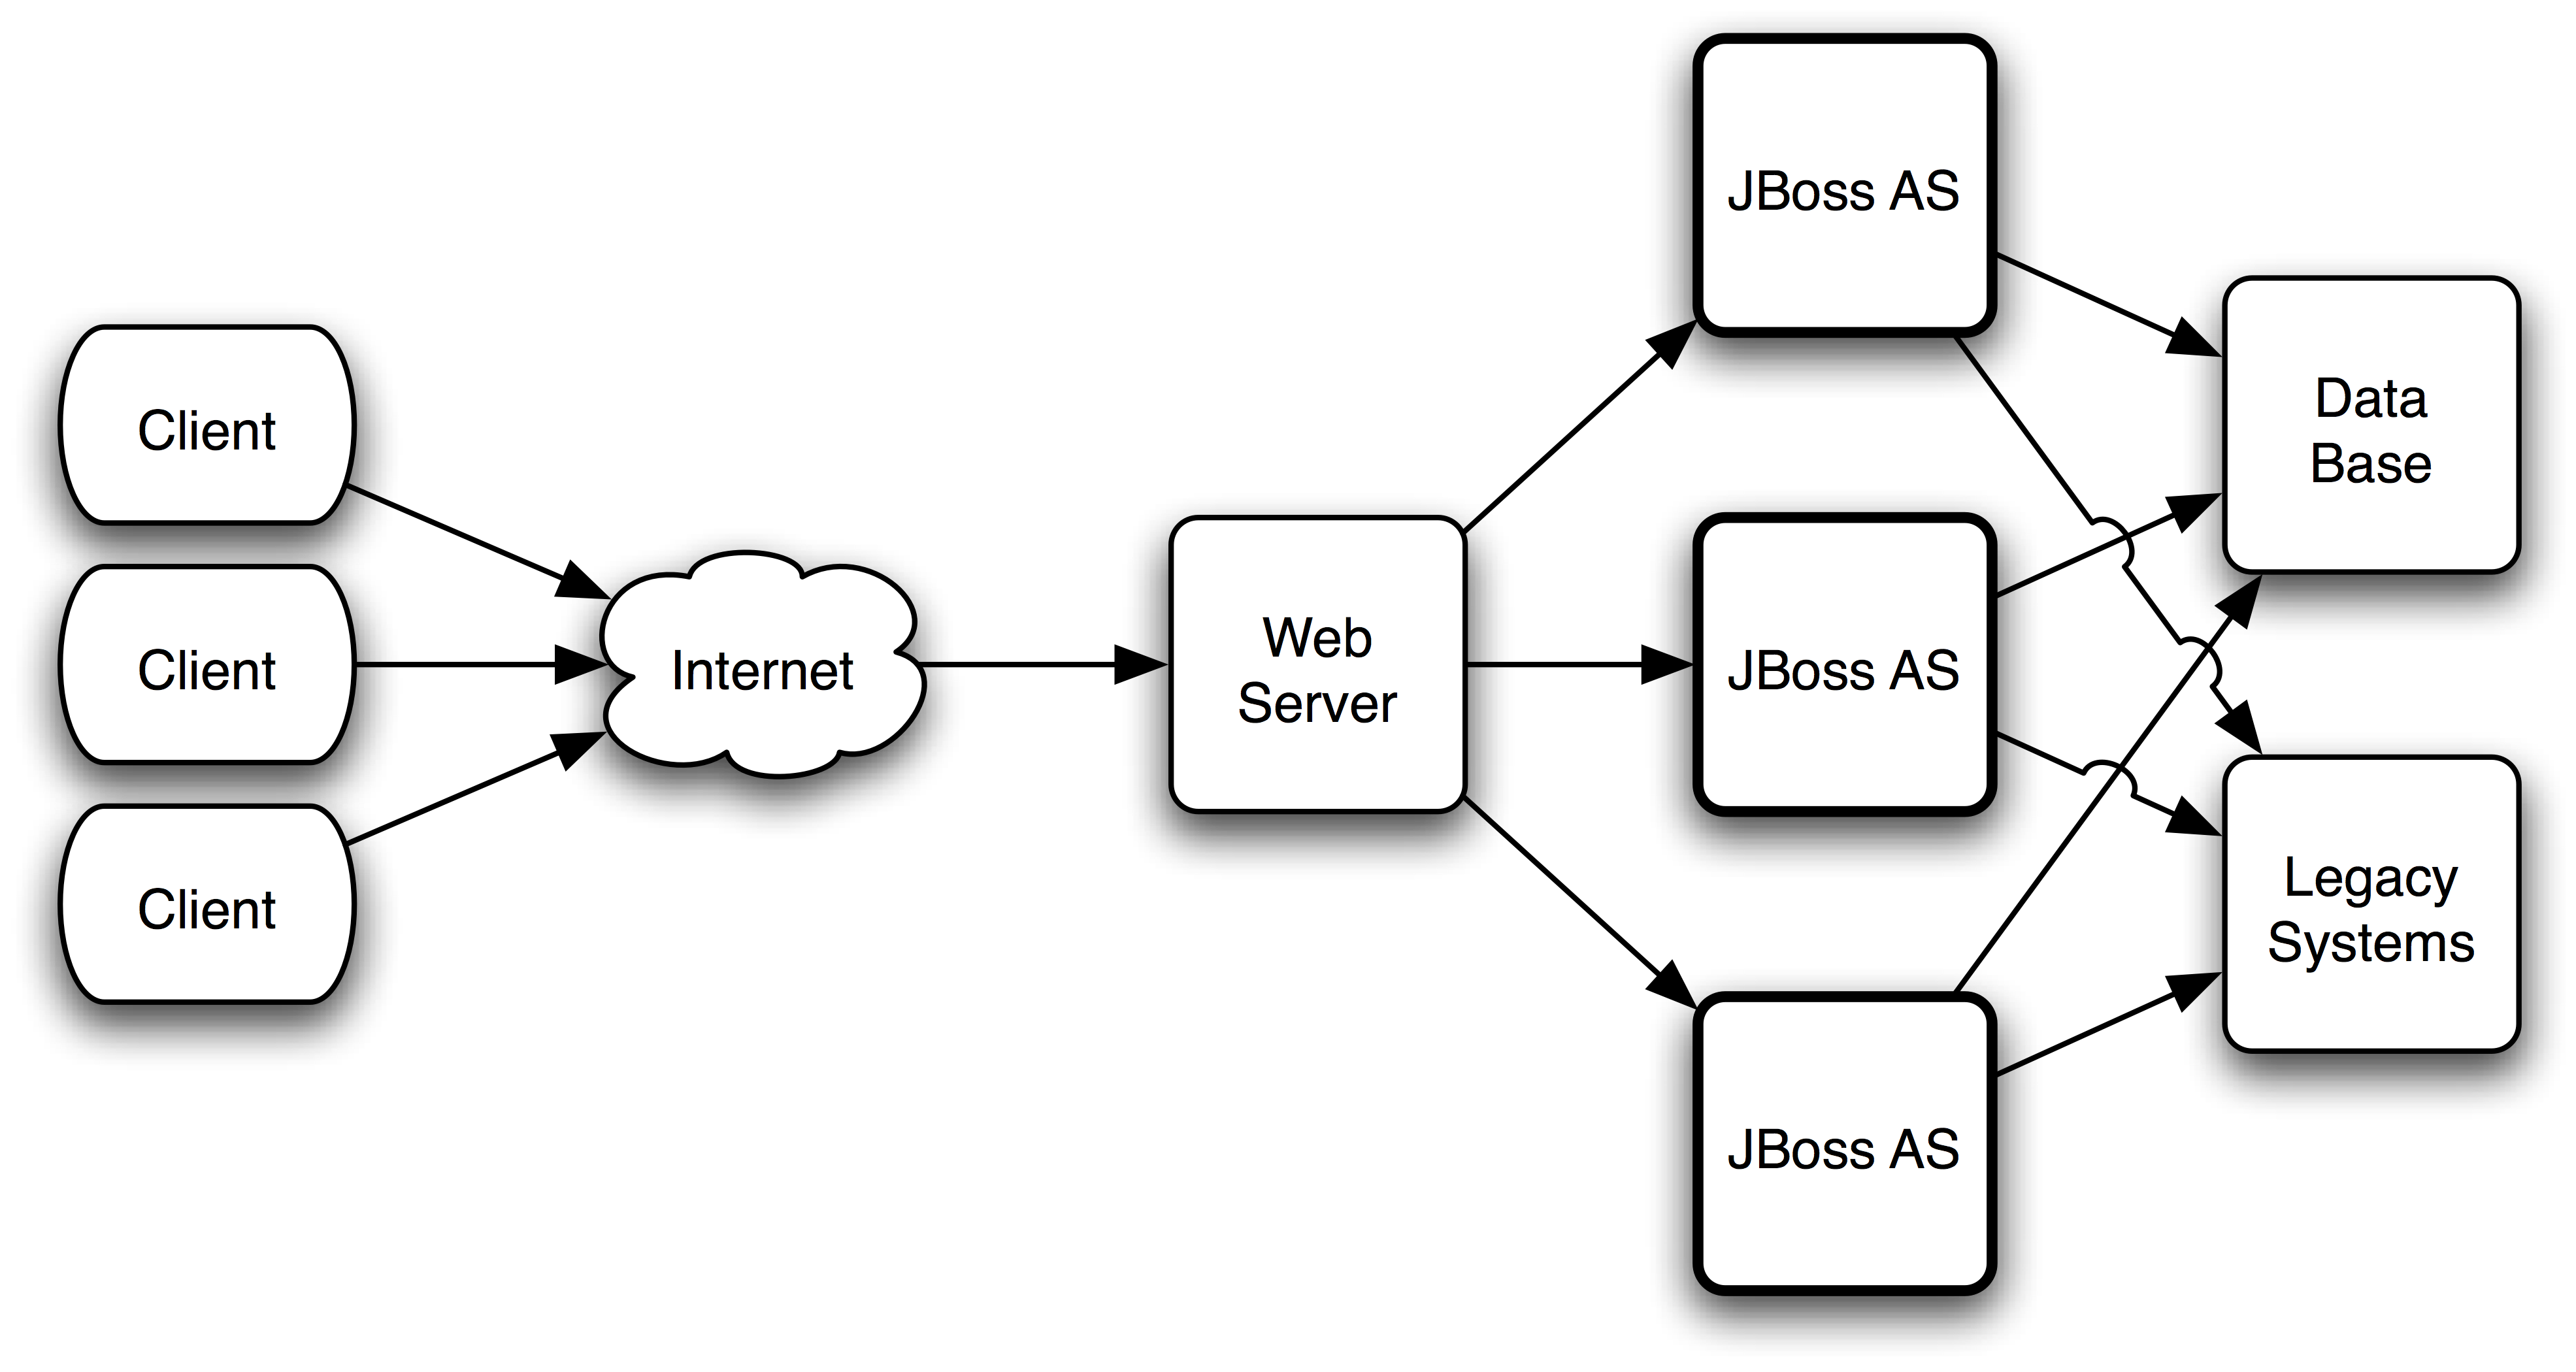 Jboss Admin Tutorial: High Availability and Scalability on JBoss